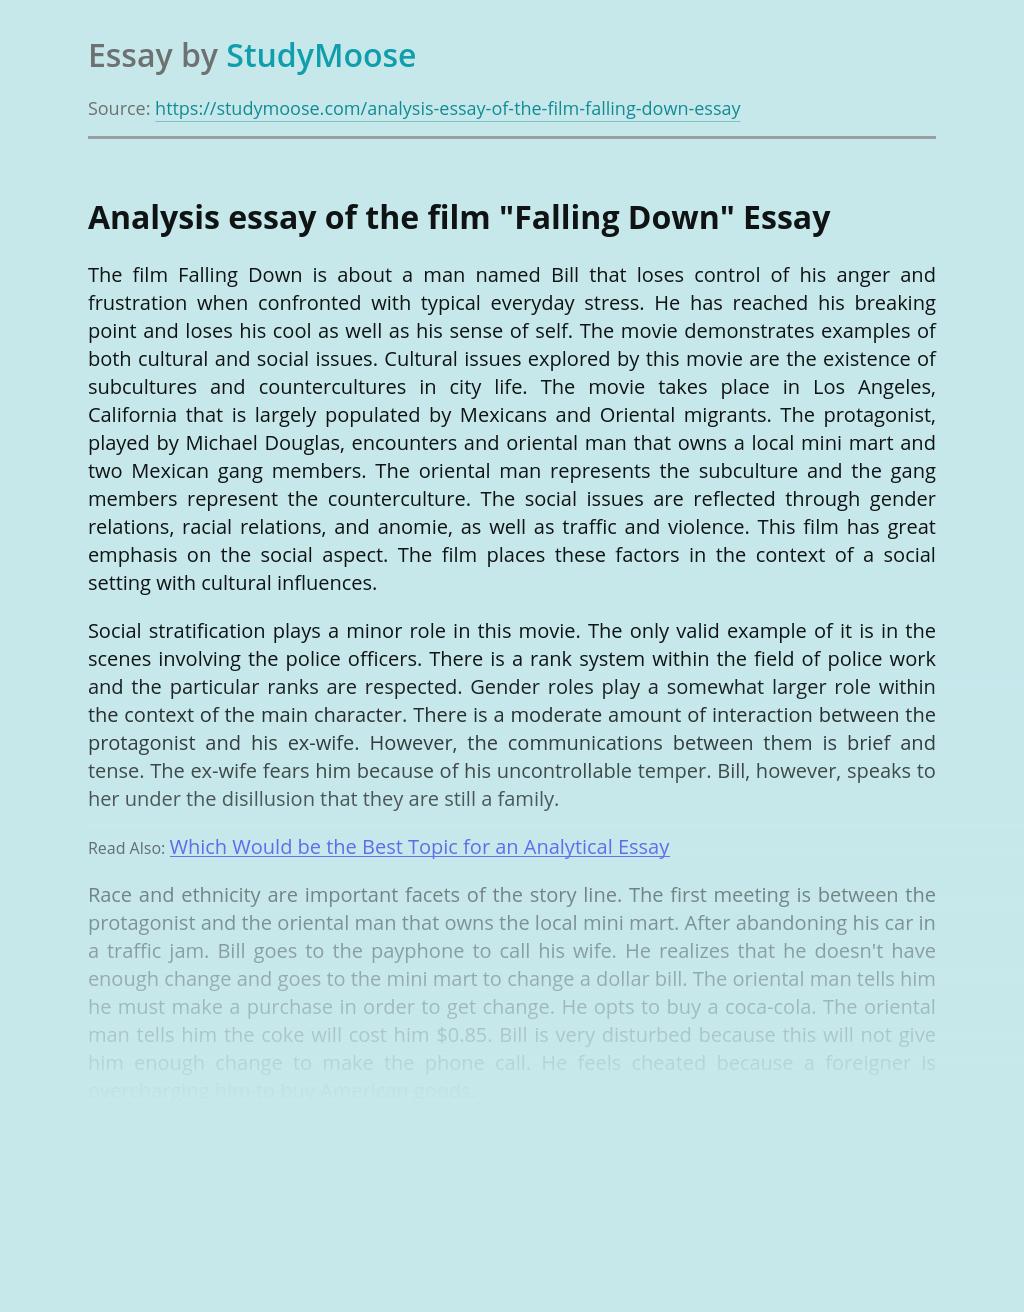 Analysis essay of the film